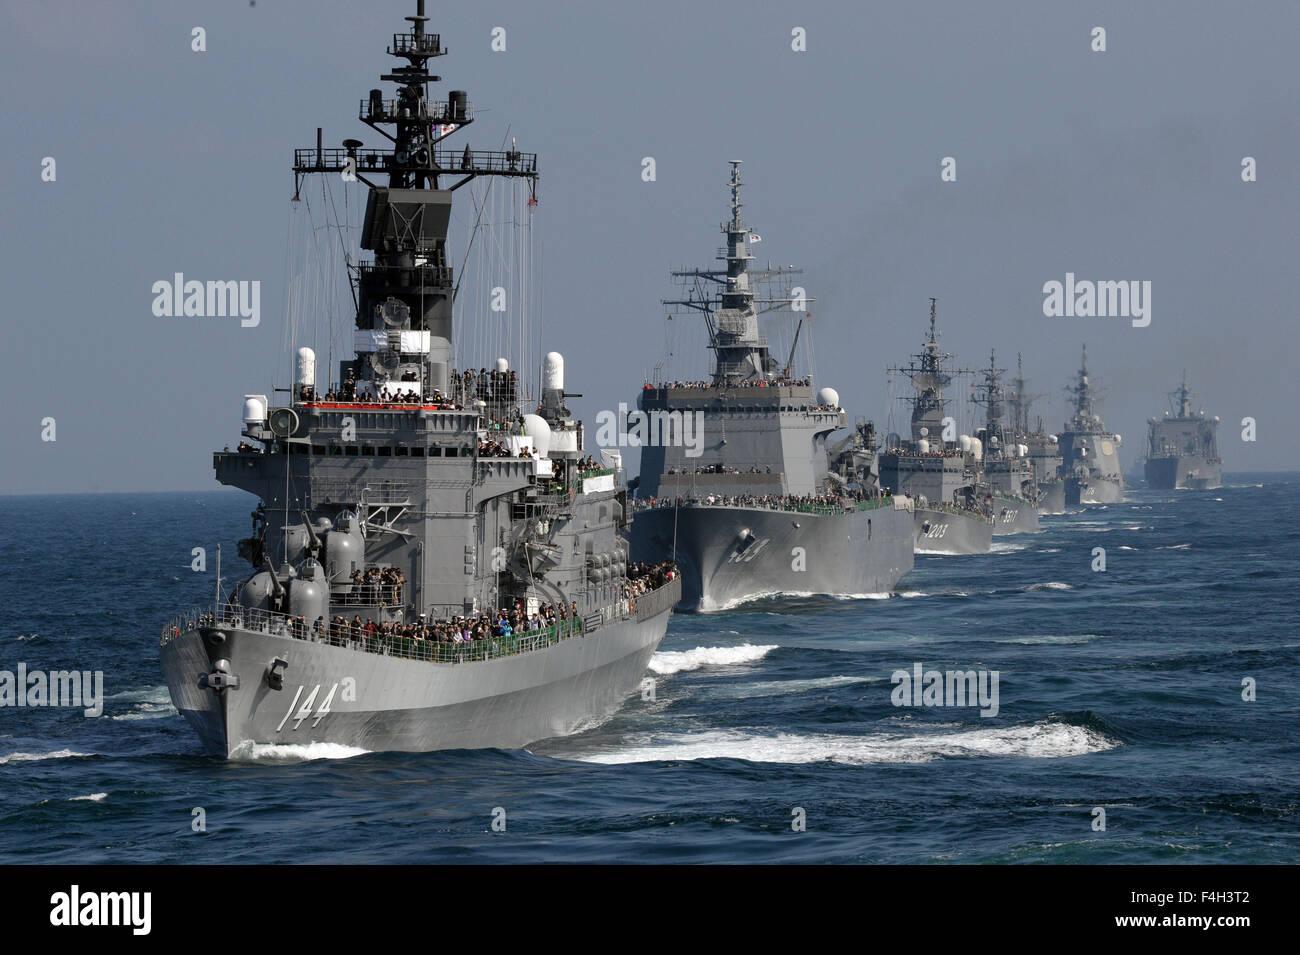 (151018) -- KANAGAWA, Oct. 18, 2015 (Xinhua) -- Japan's Maritime Self-Defense Force (MSDF) ships sail during - Stock Image